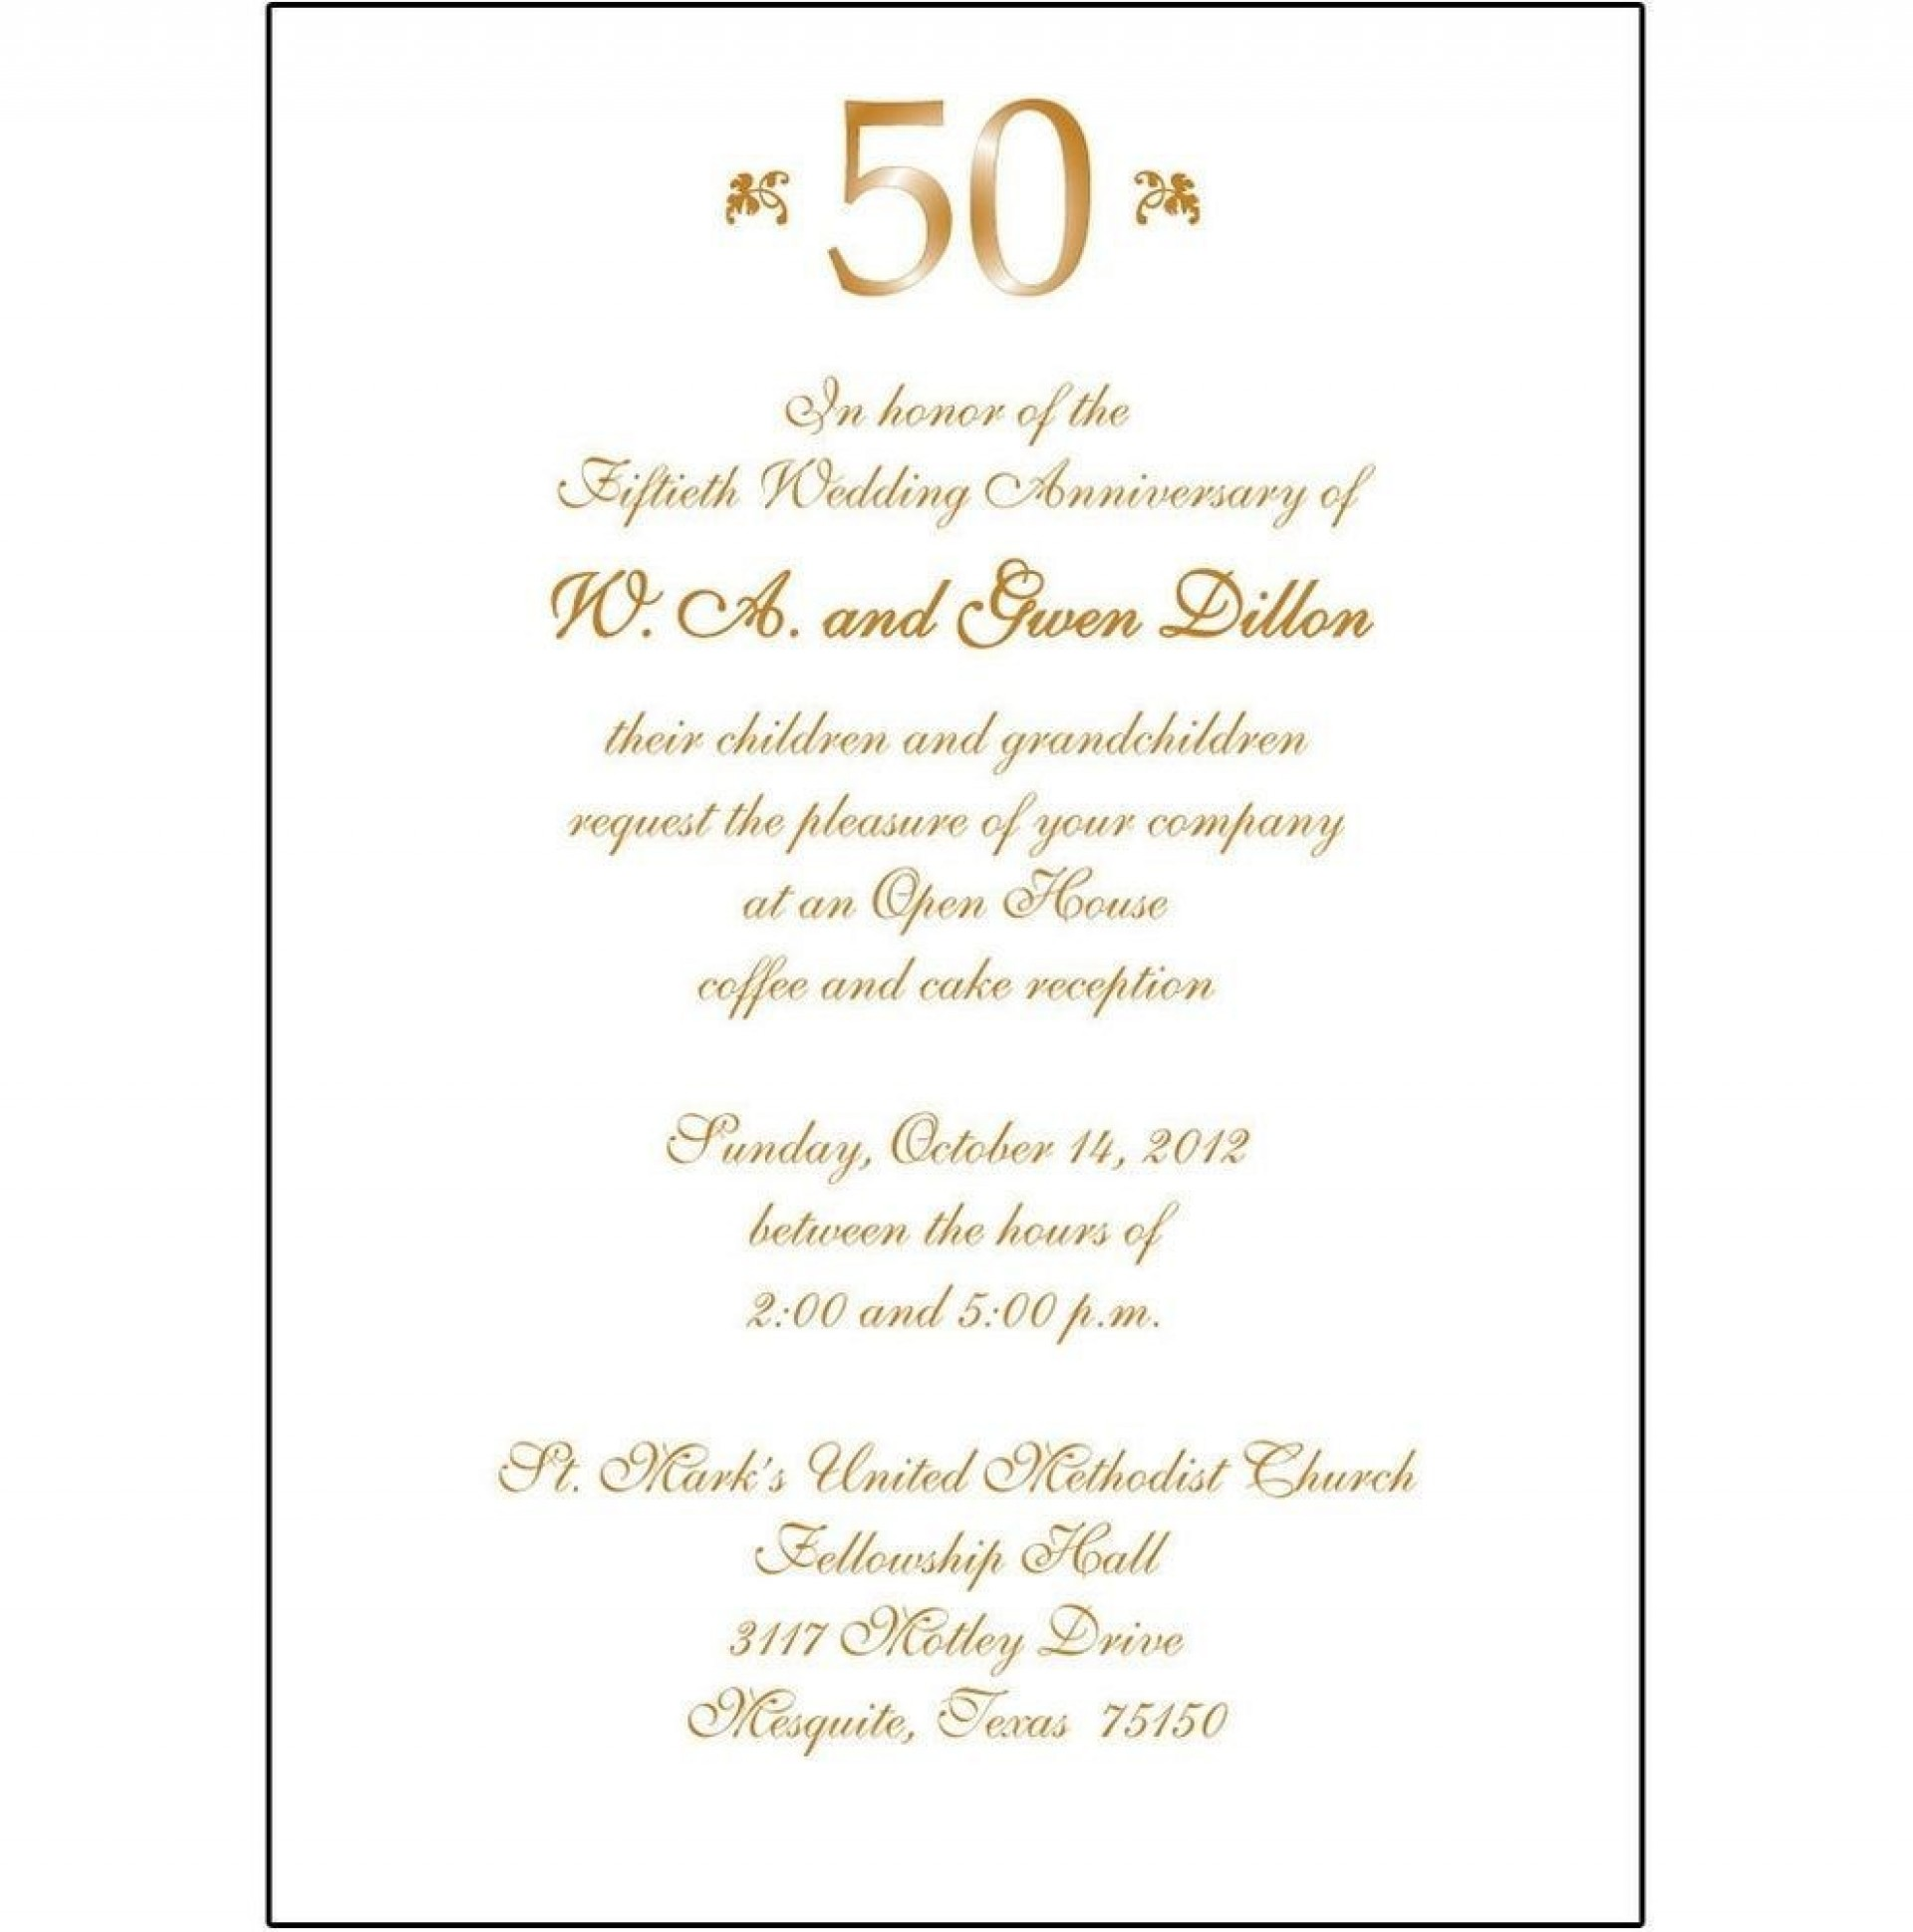 007 Singular 50th Anniversary Invitation Template Idea  Templates Wedding Free Download Golden1920